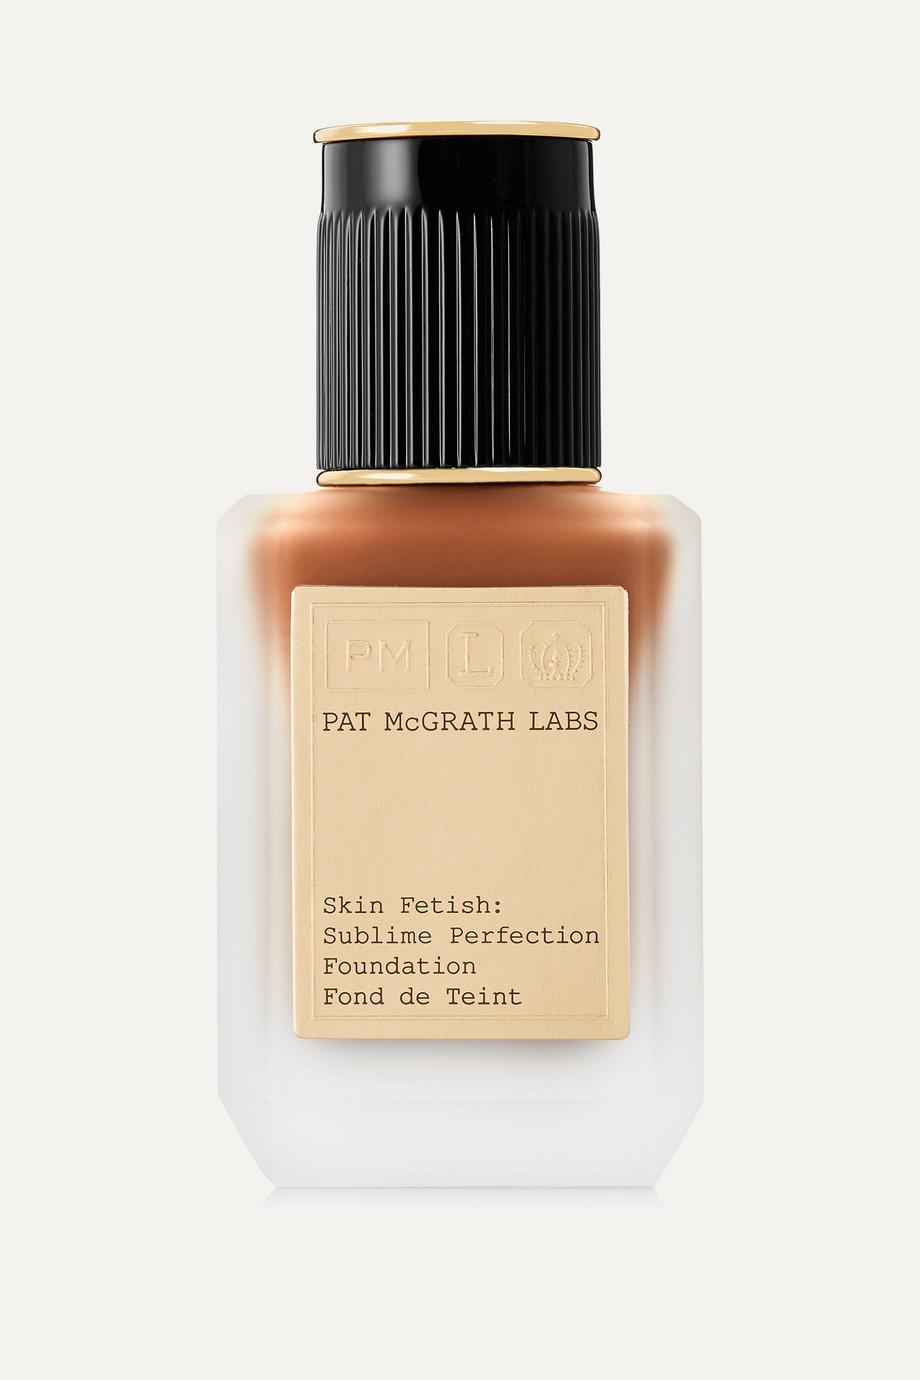 Pat McGrath Labs Skin Fetish: Sublime Perfection Foundation - Medium Deep 27, 35ml